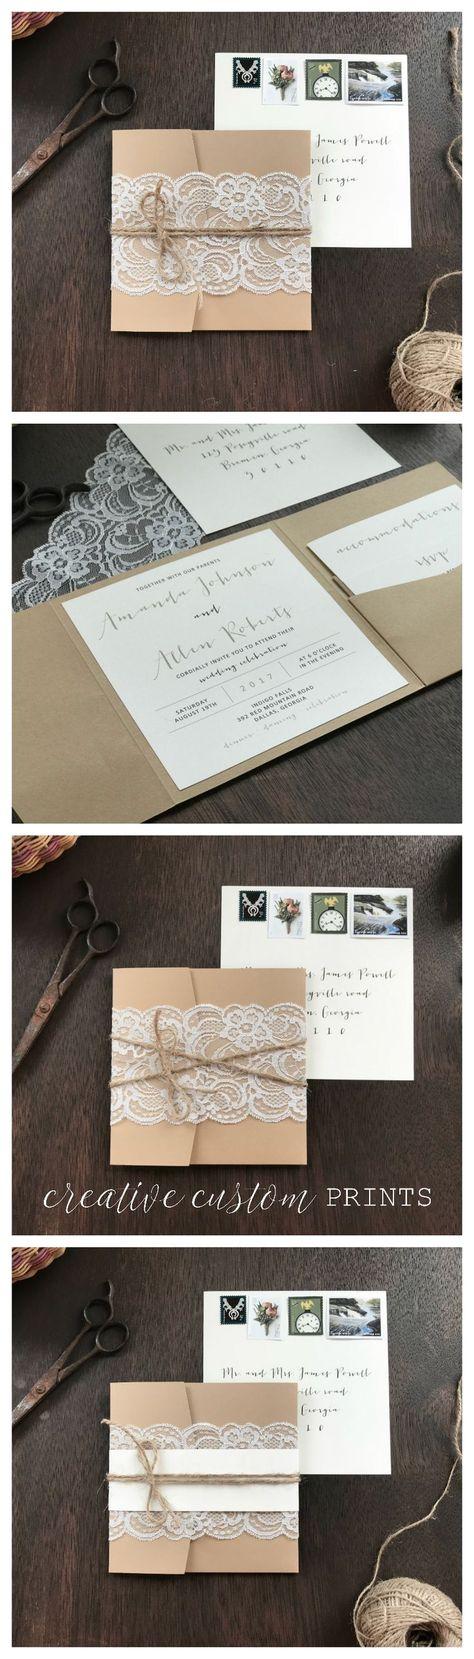 Lace Wedding Invitation Set, Rustic Wedding Invitation, Pocket Wedding Invitation, Elegant Wedding Invitation, Romantic Wedding Invitation